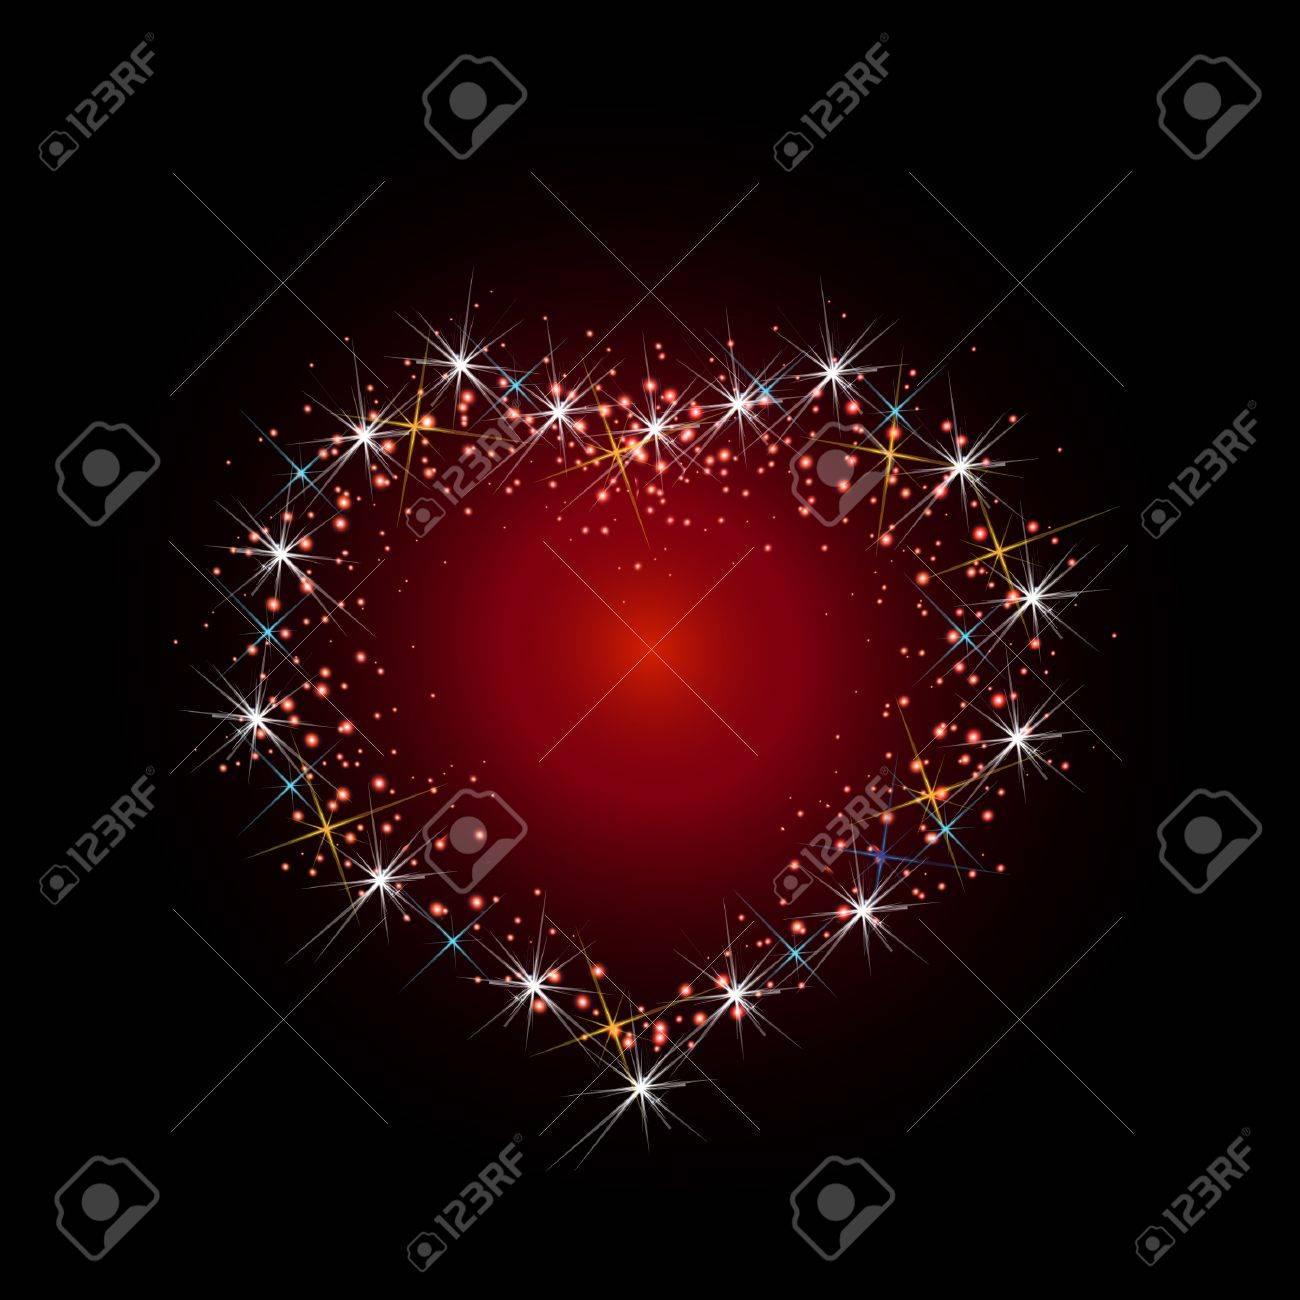 Constellation of love illustration Stock Vector - 21454370